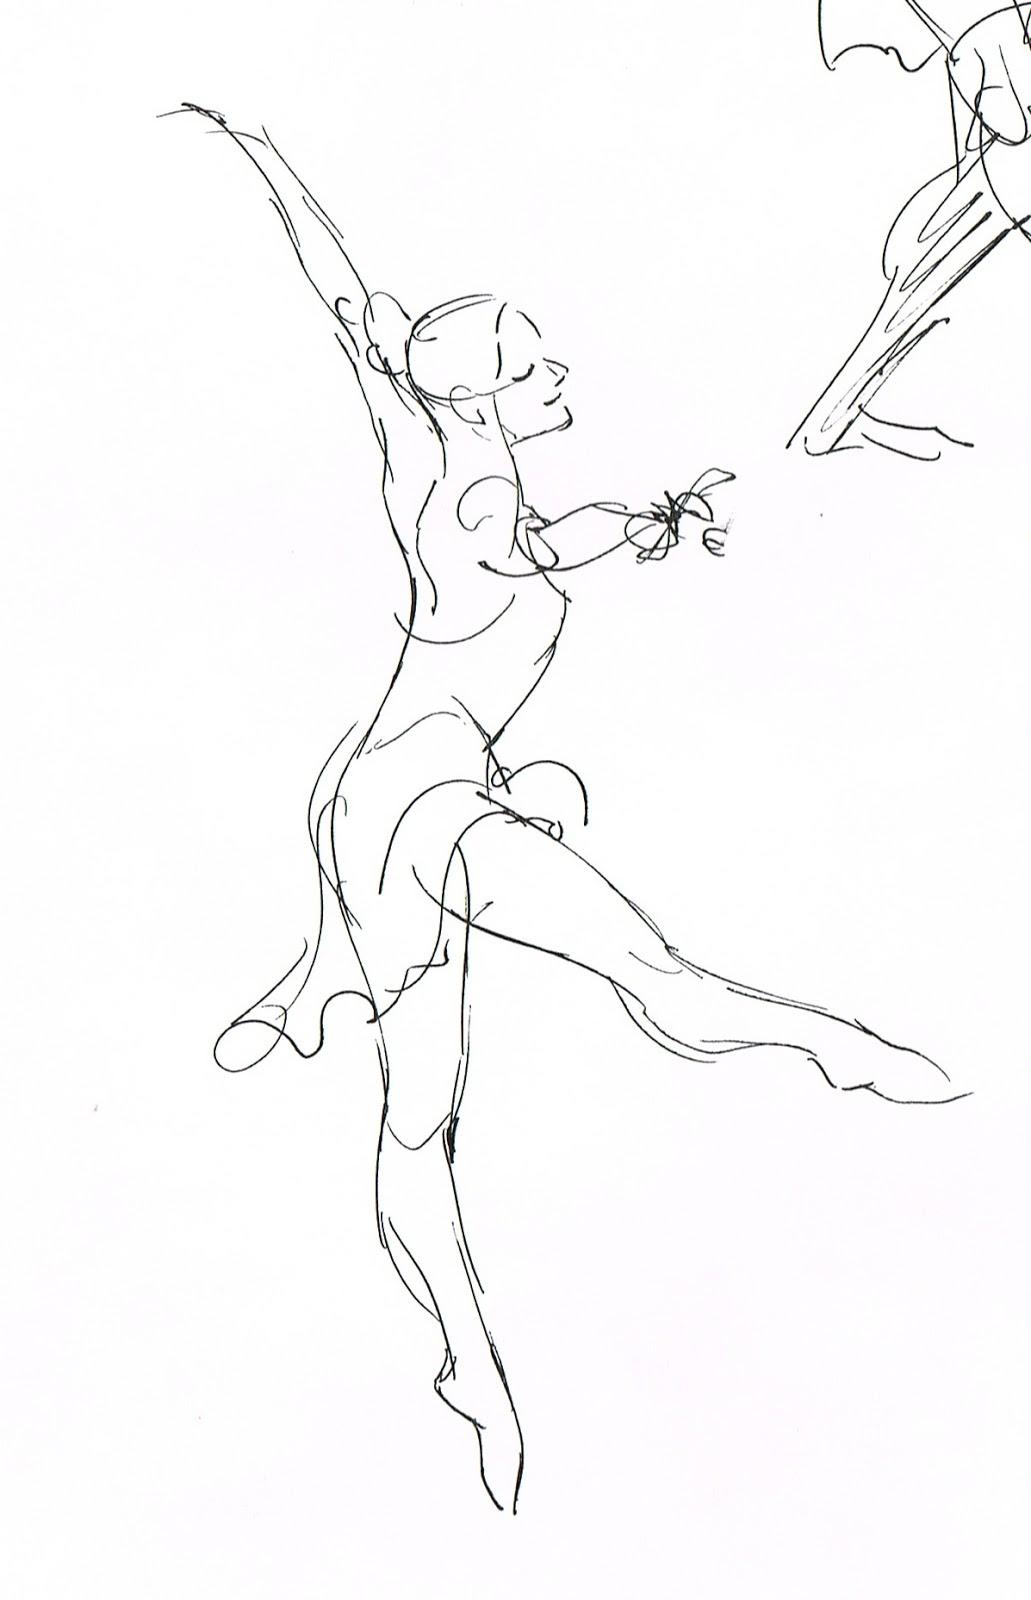 1031x1600 Hand Drawn Nomad Figure Drawing Pinterest Hand drawn